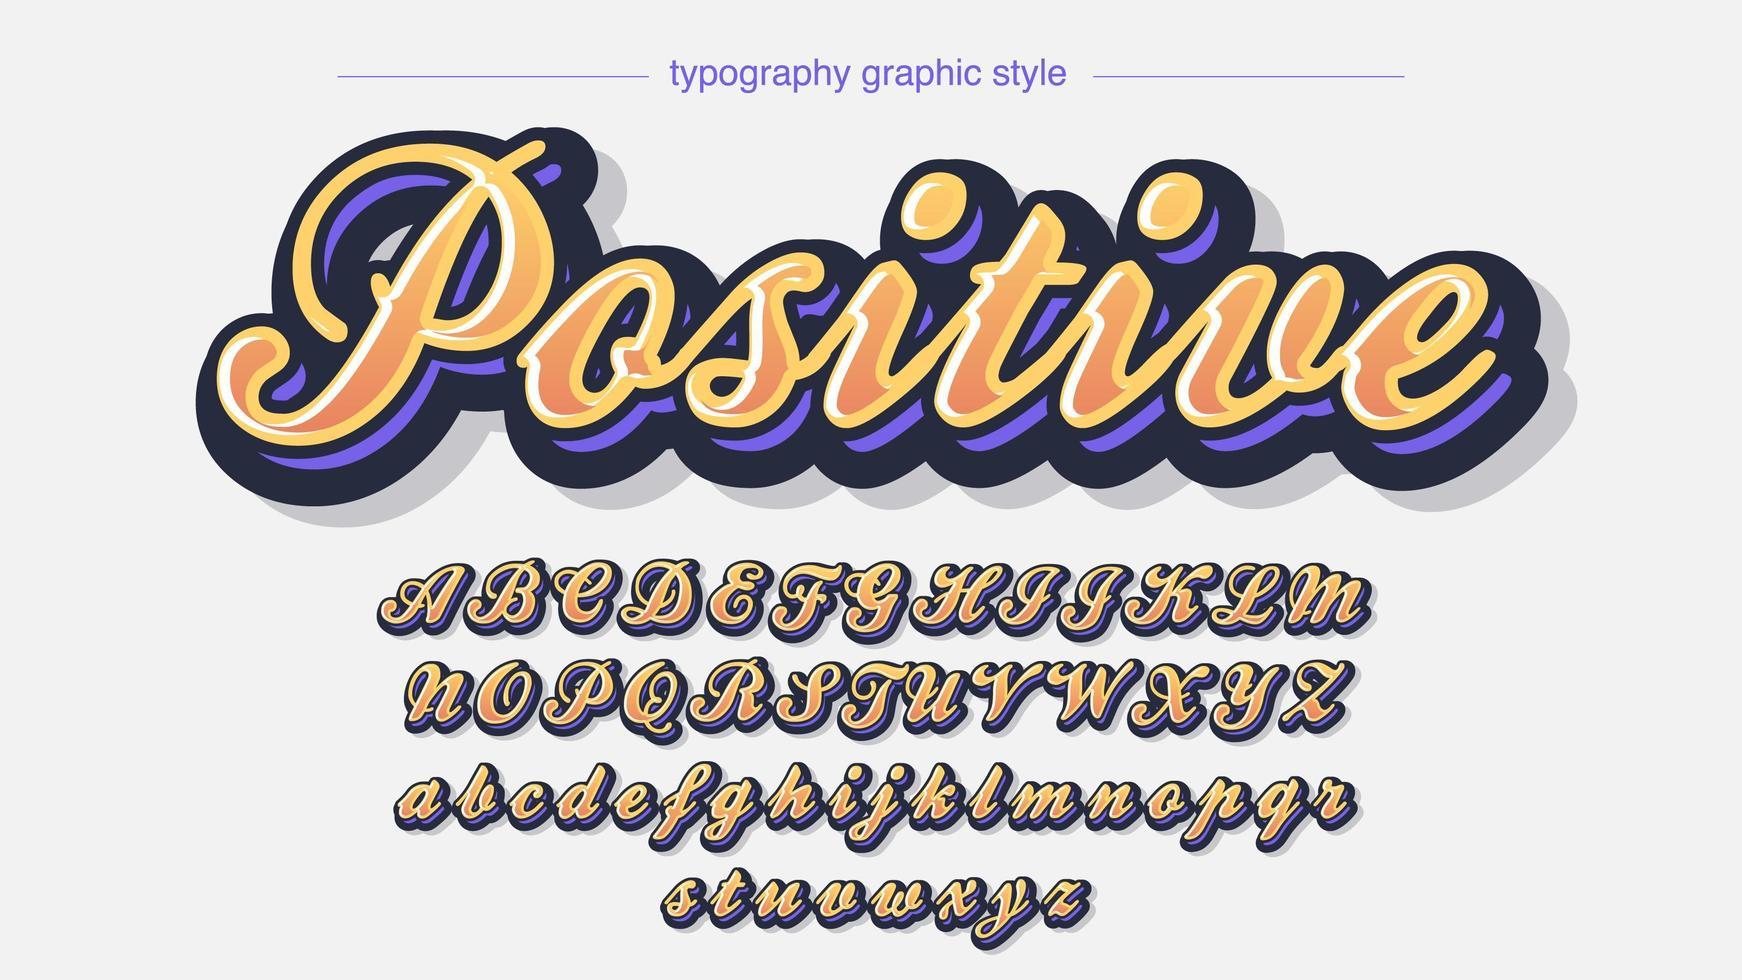 fonte artística 3d de caligrafia colorida laranja vetor